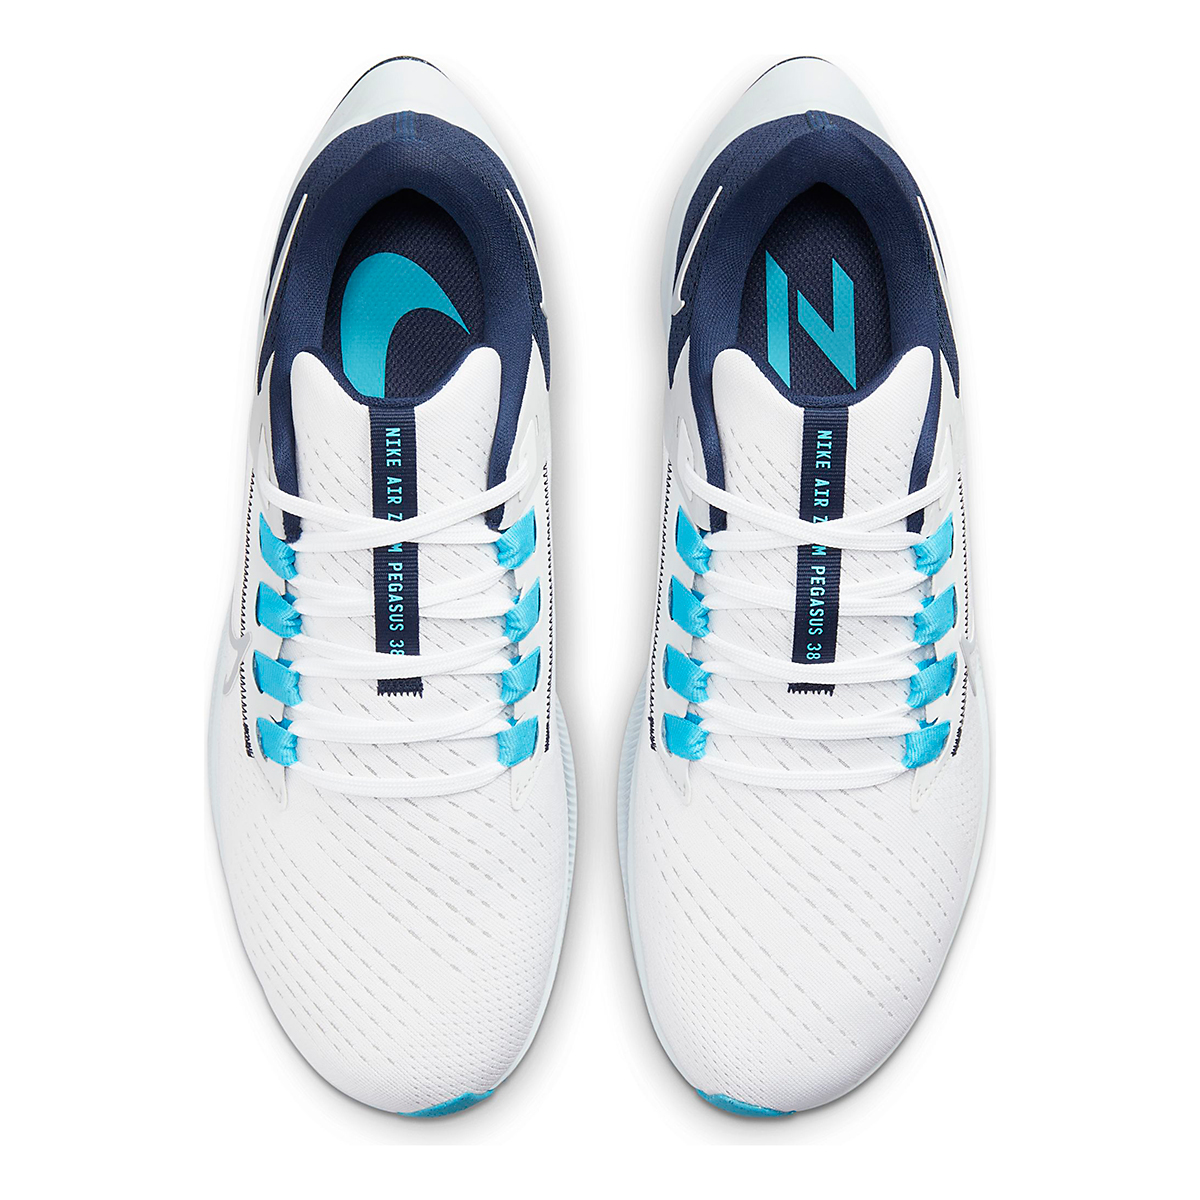 Men's Nike Air Zoom Pegasus 38 Running Shoe - Color: White/Wolf Grey/Pure Platinum - Size: 6 - Width: Regular, White/Wolf Grey/Pure Platinum, large, image 6